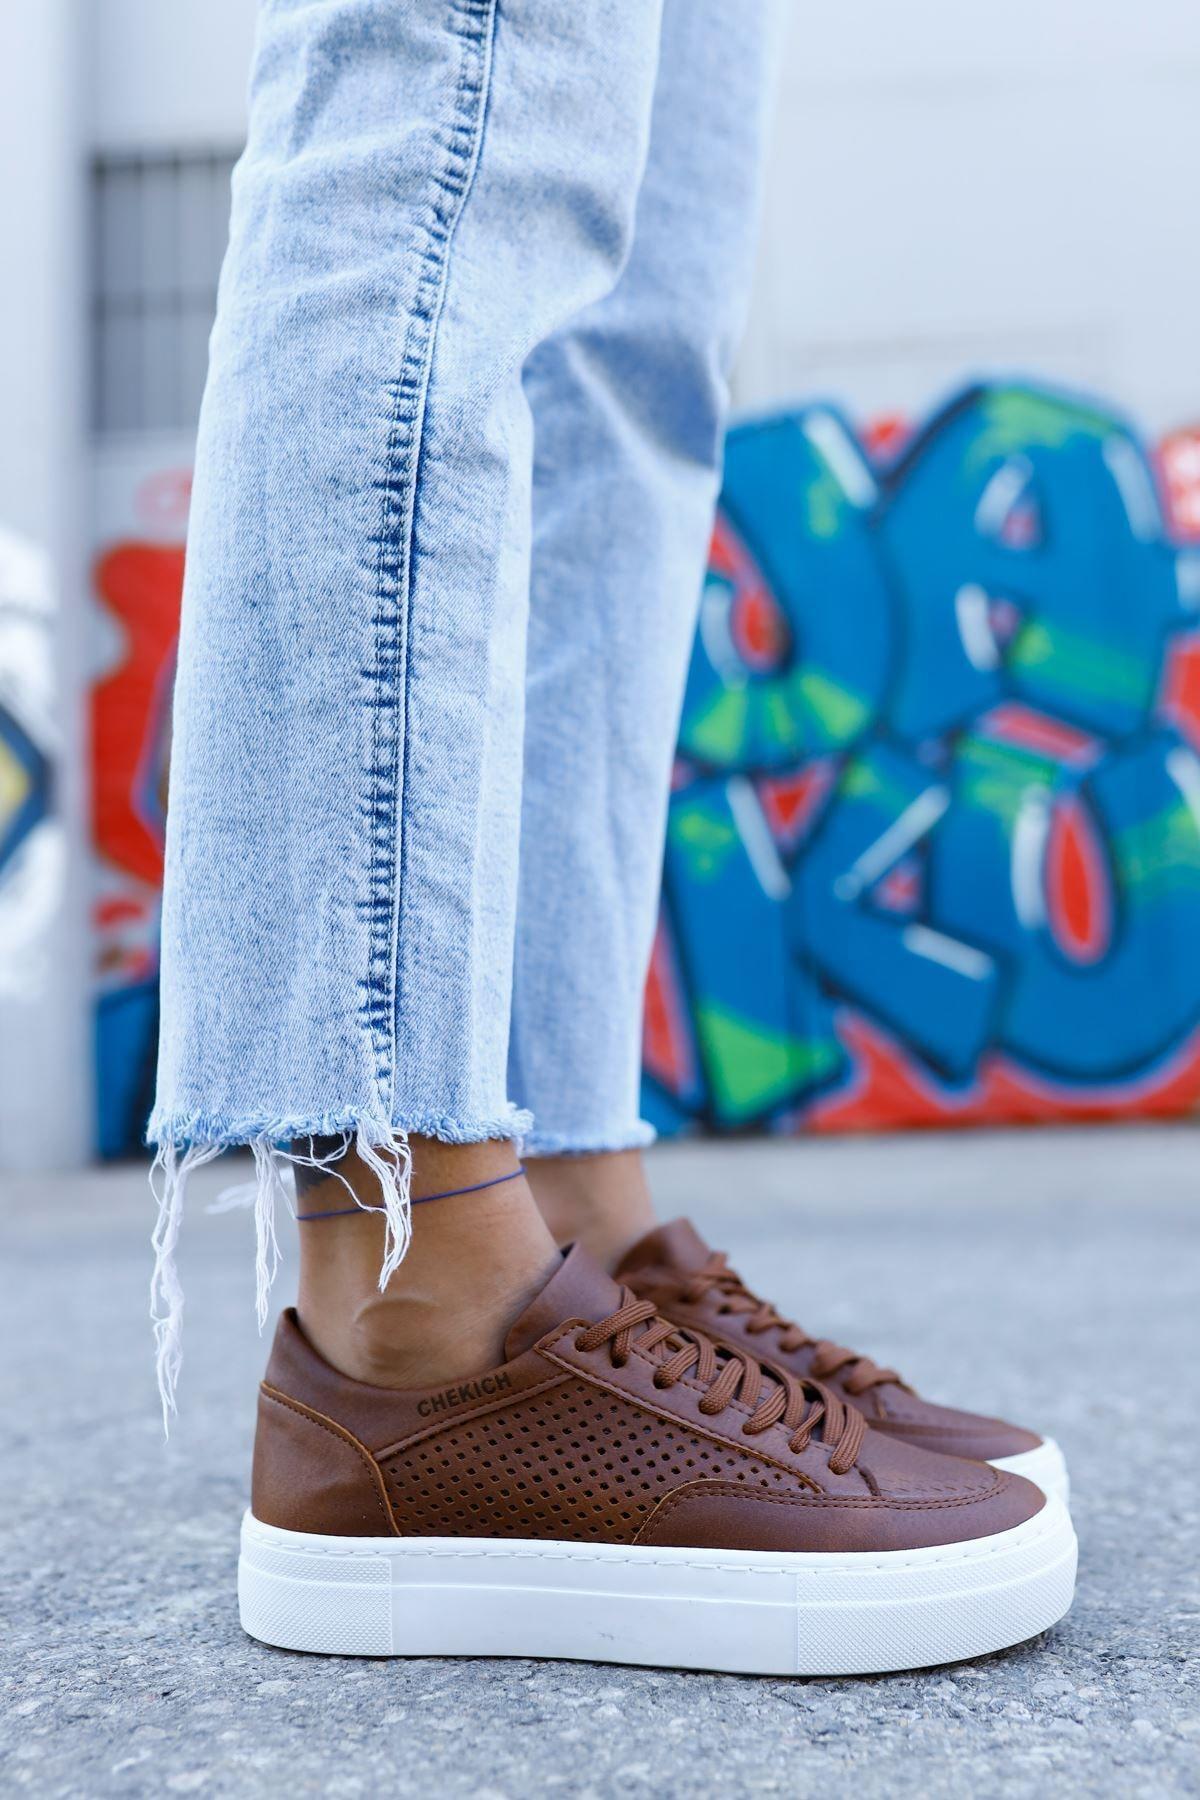 Chekich Ch015 Bt Kadın Ayakkabı Taba 1